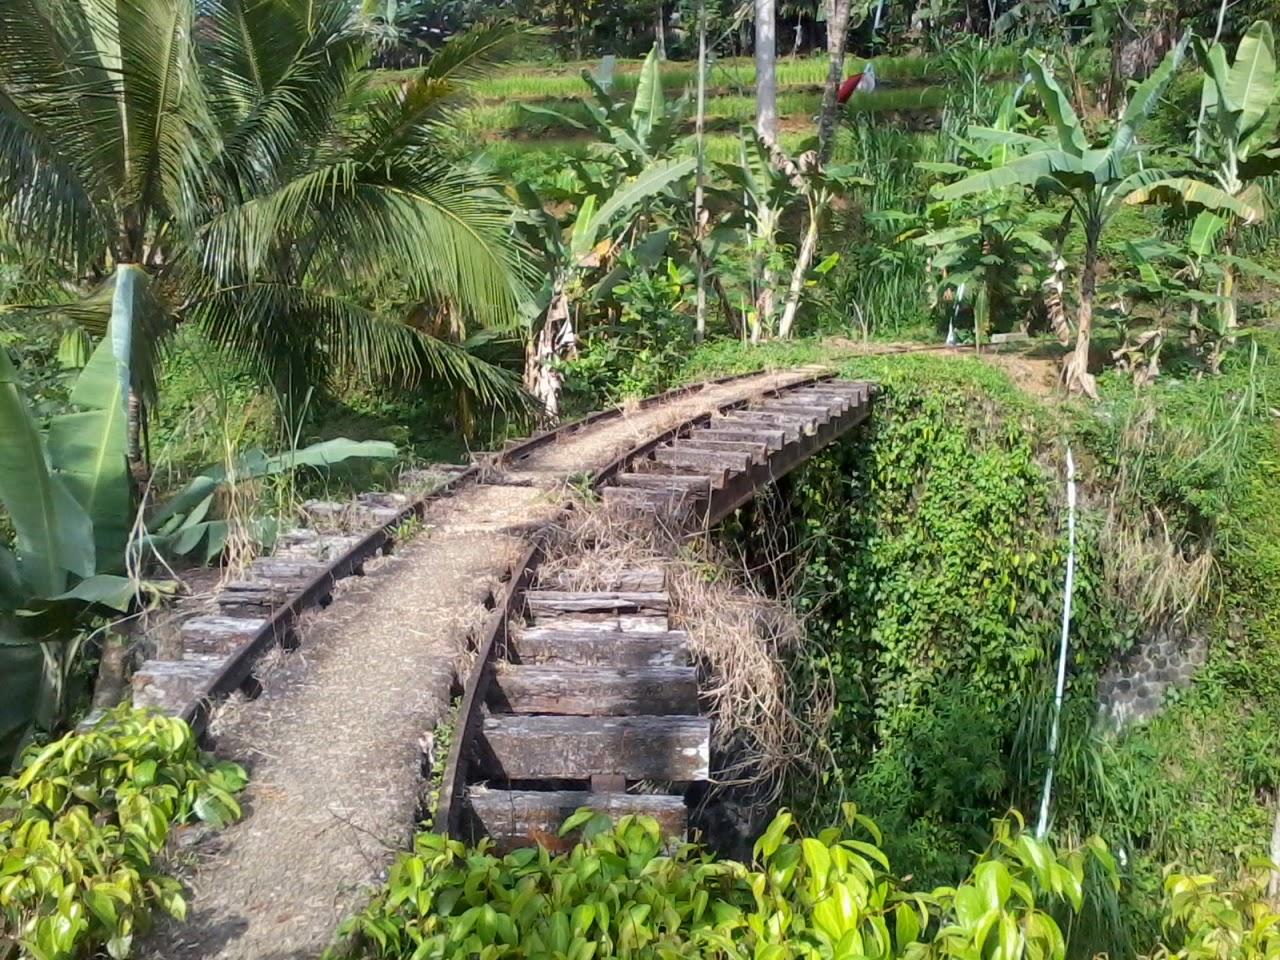 Desa Wisata Ketenger Banyumas Jawa Tengah Alamnya Menarik Memiliki Situs